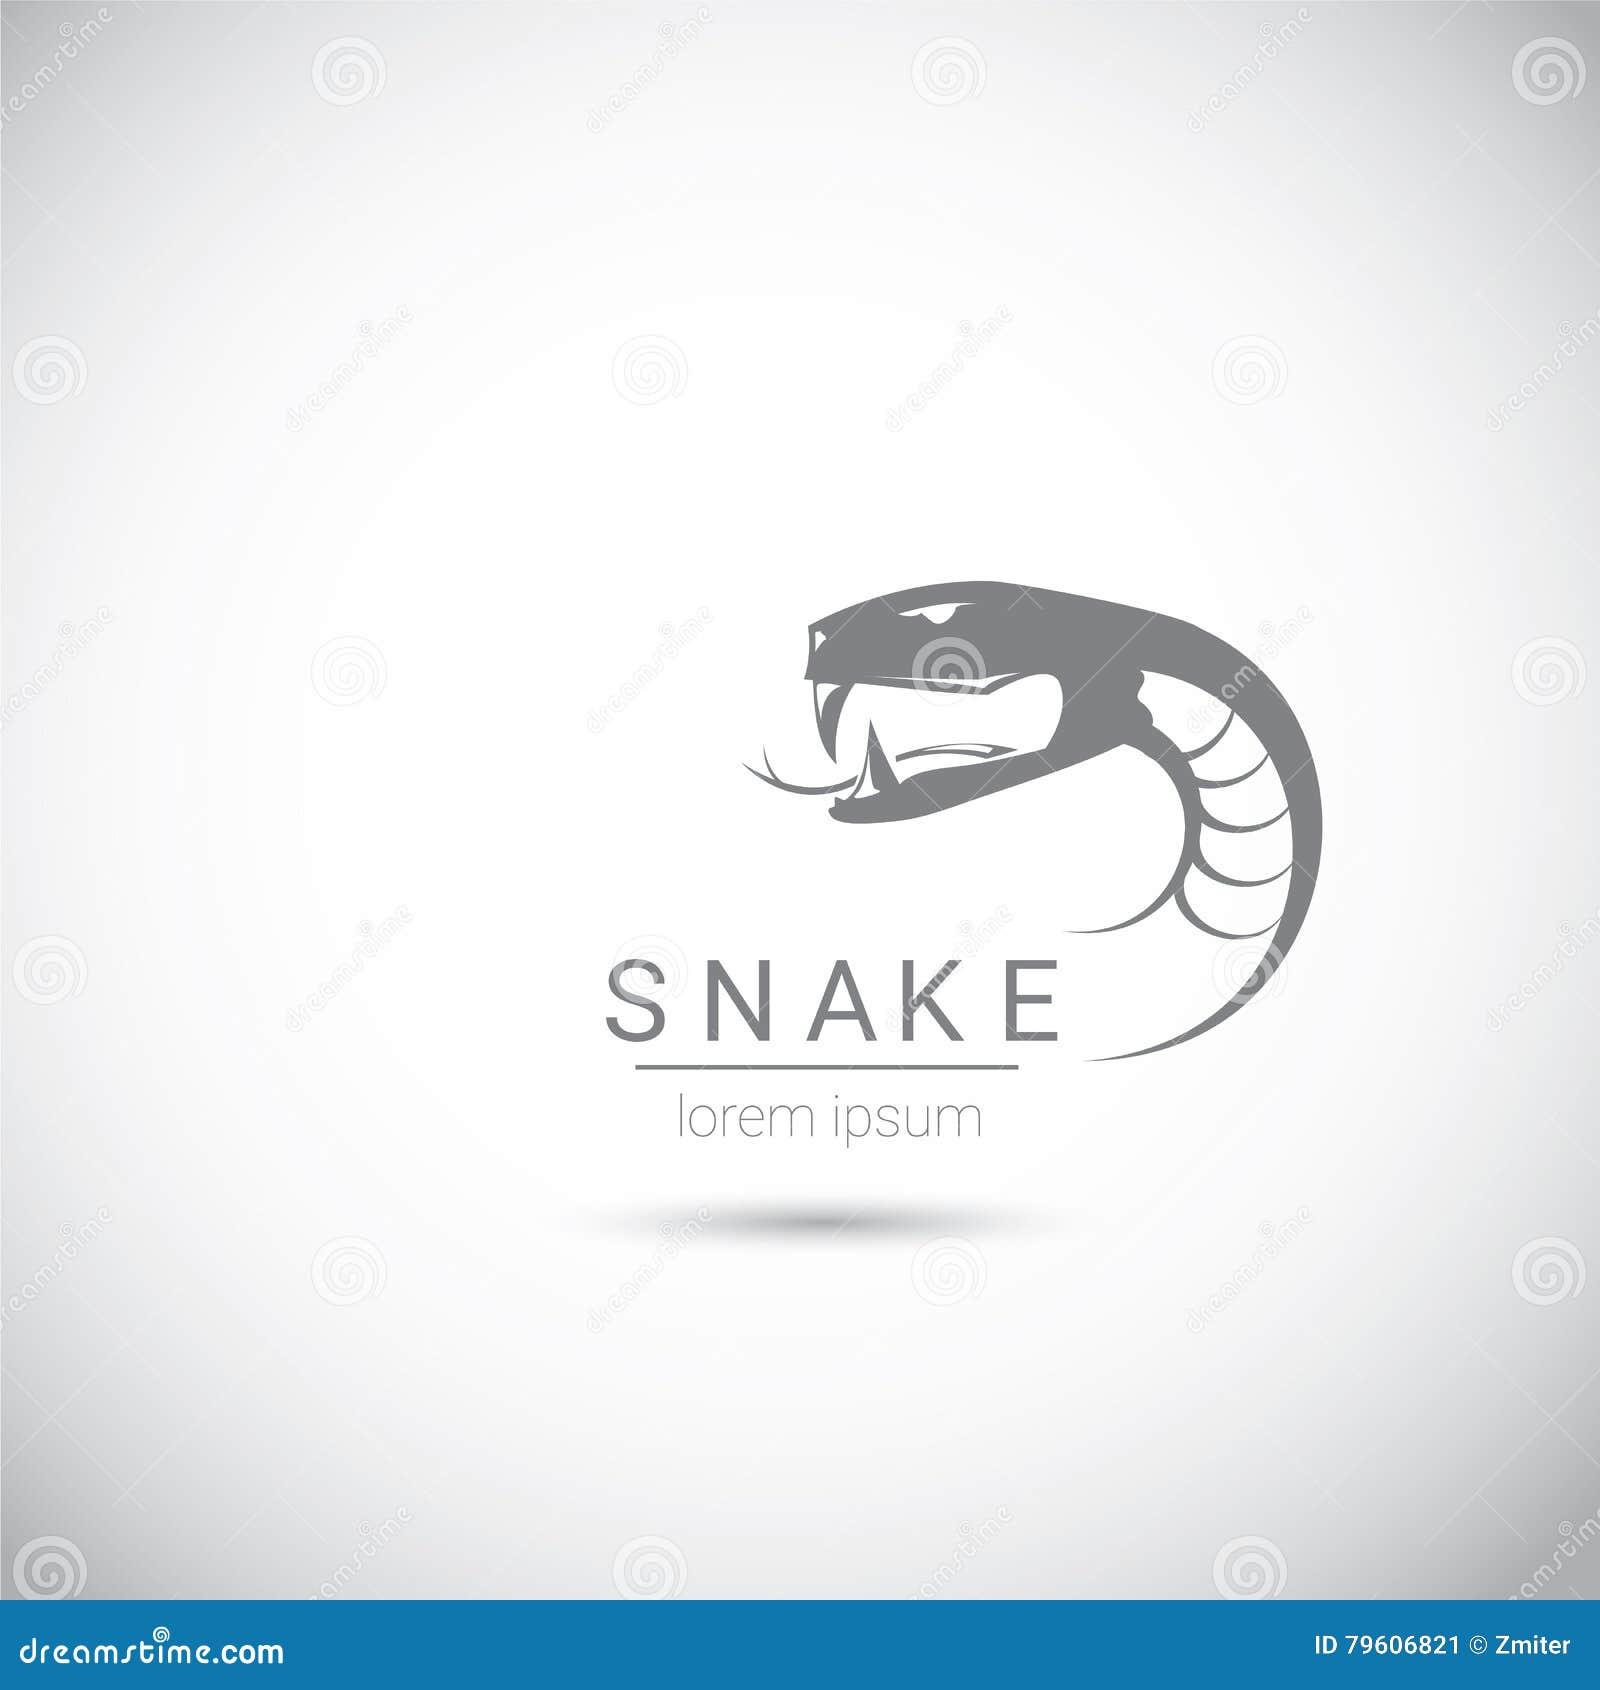 Elemento preto simples do projeto do logotipo da serpente do vetor